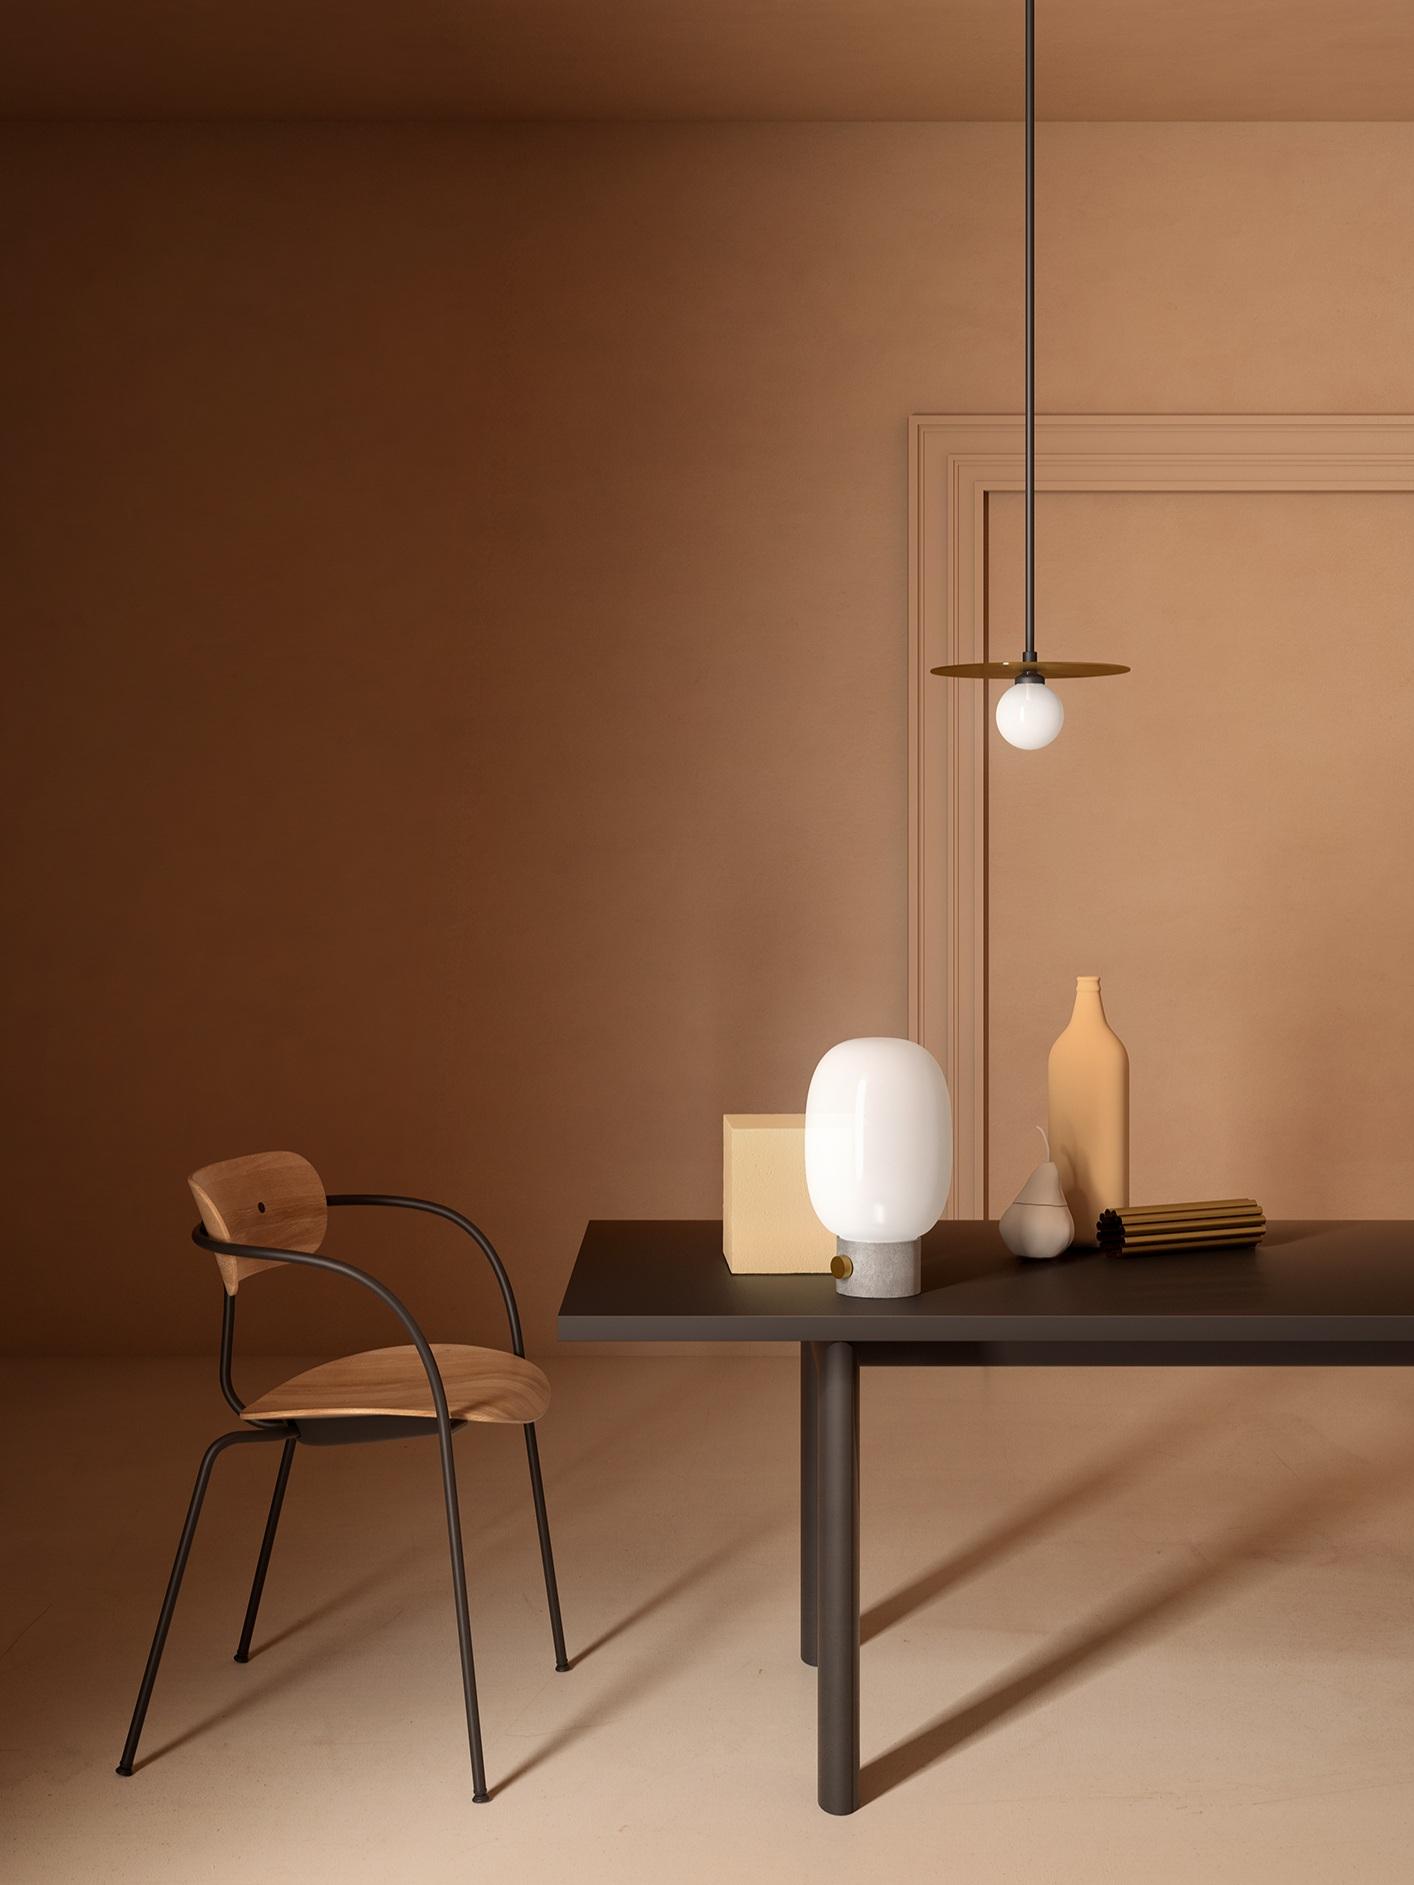 Disc and sphere     pendant light | 140OL-P Insideart Giorgio Morandi